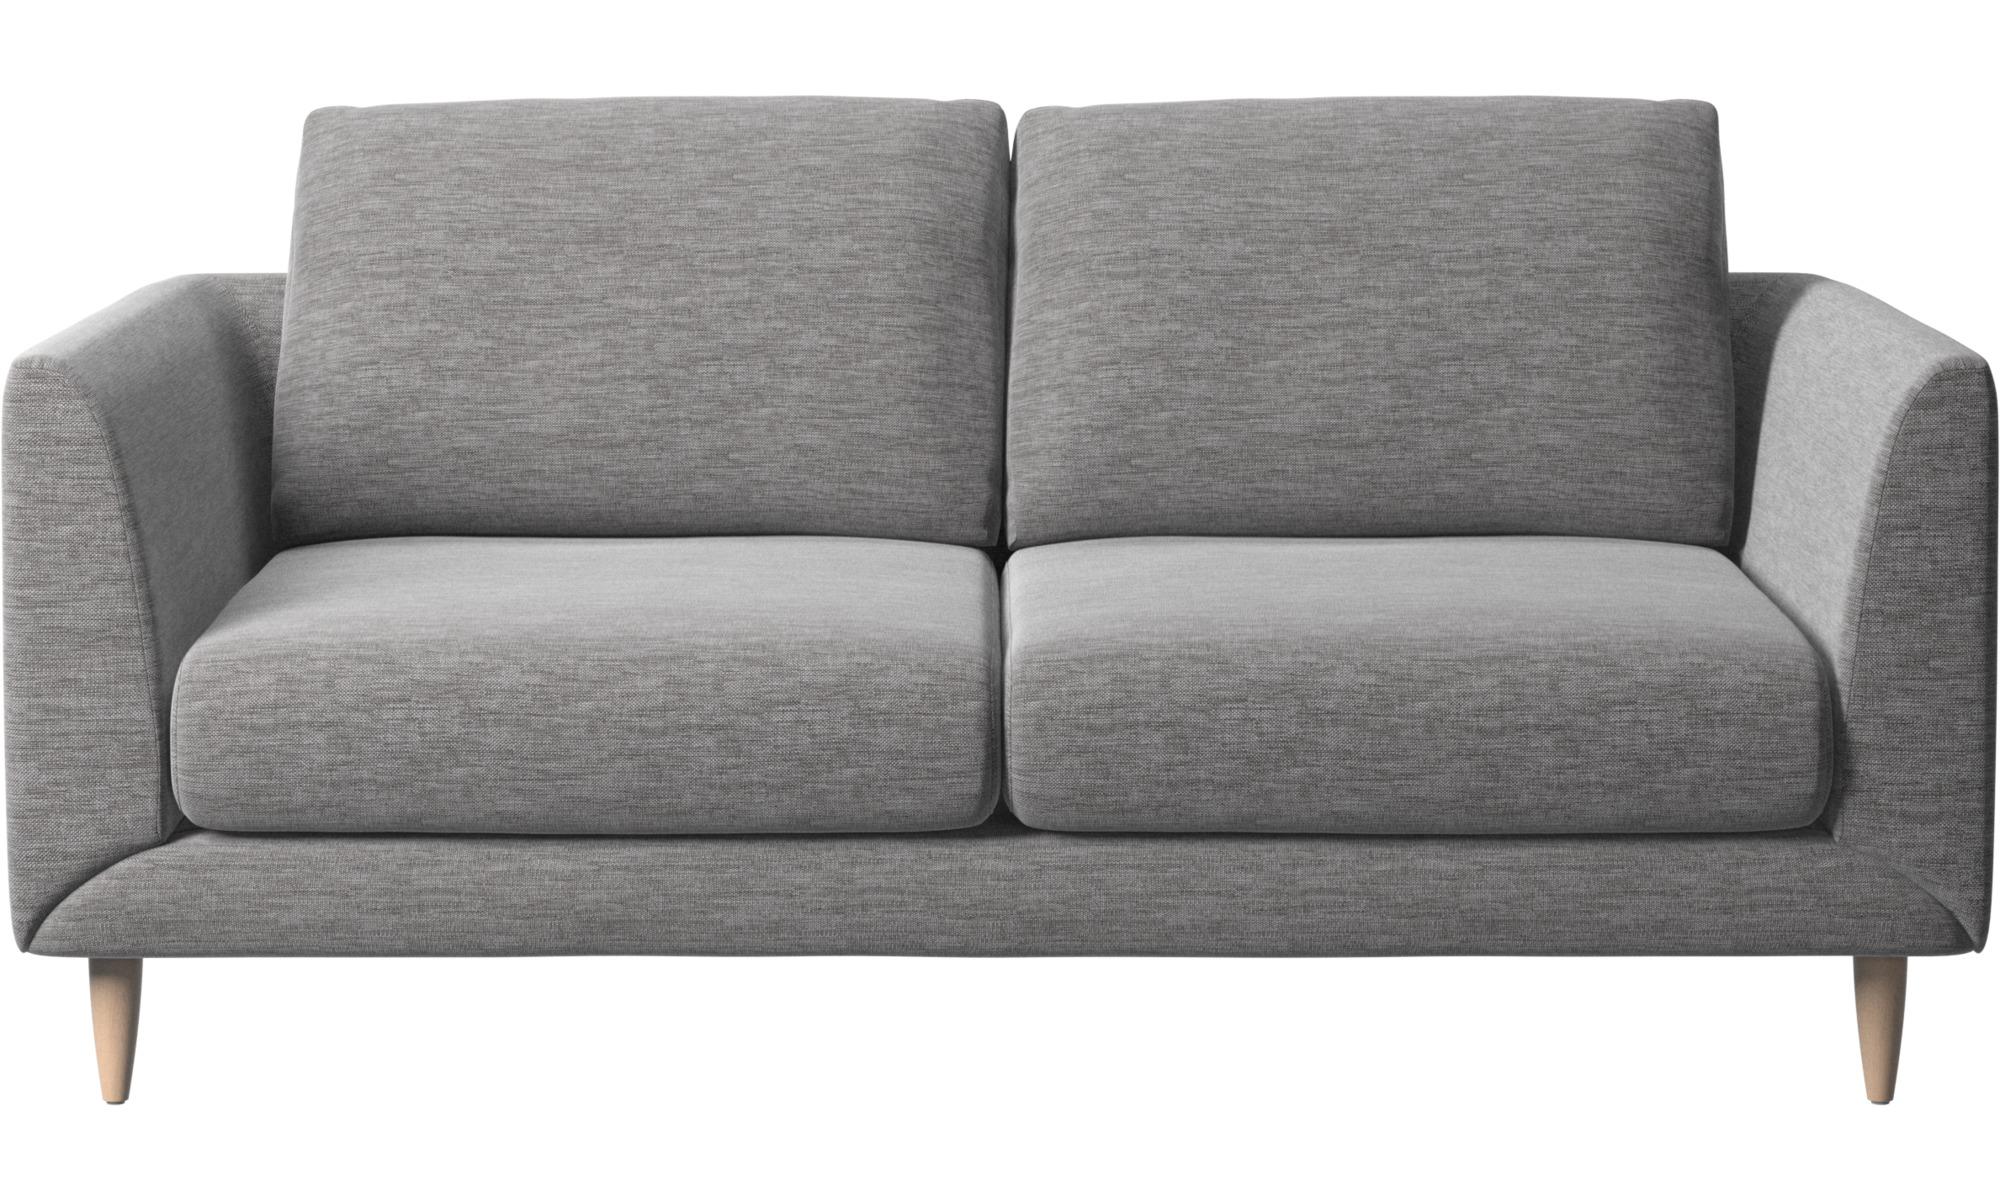 2 personers sofaer fargo sofa boconcept. Black Bedroom Furniture Sets. Home Design Ideas